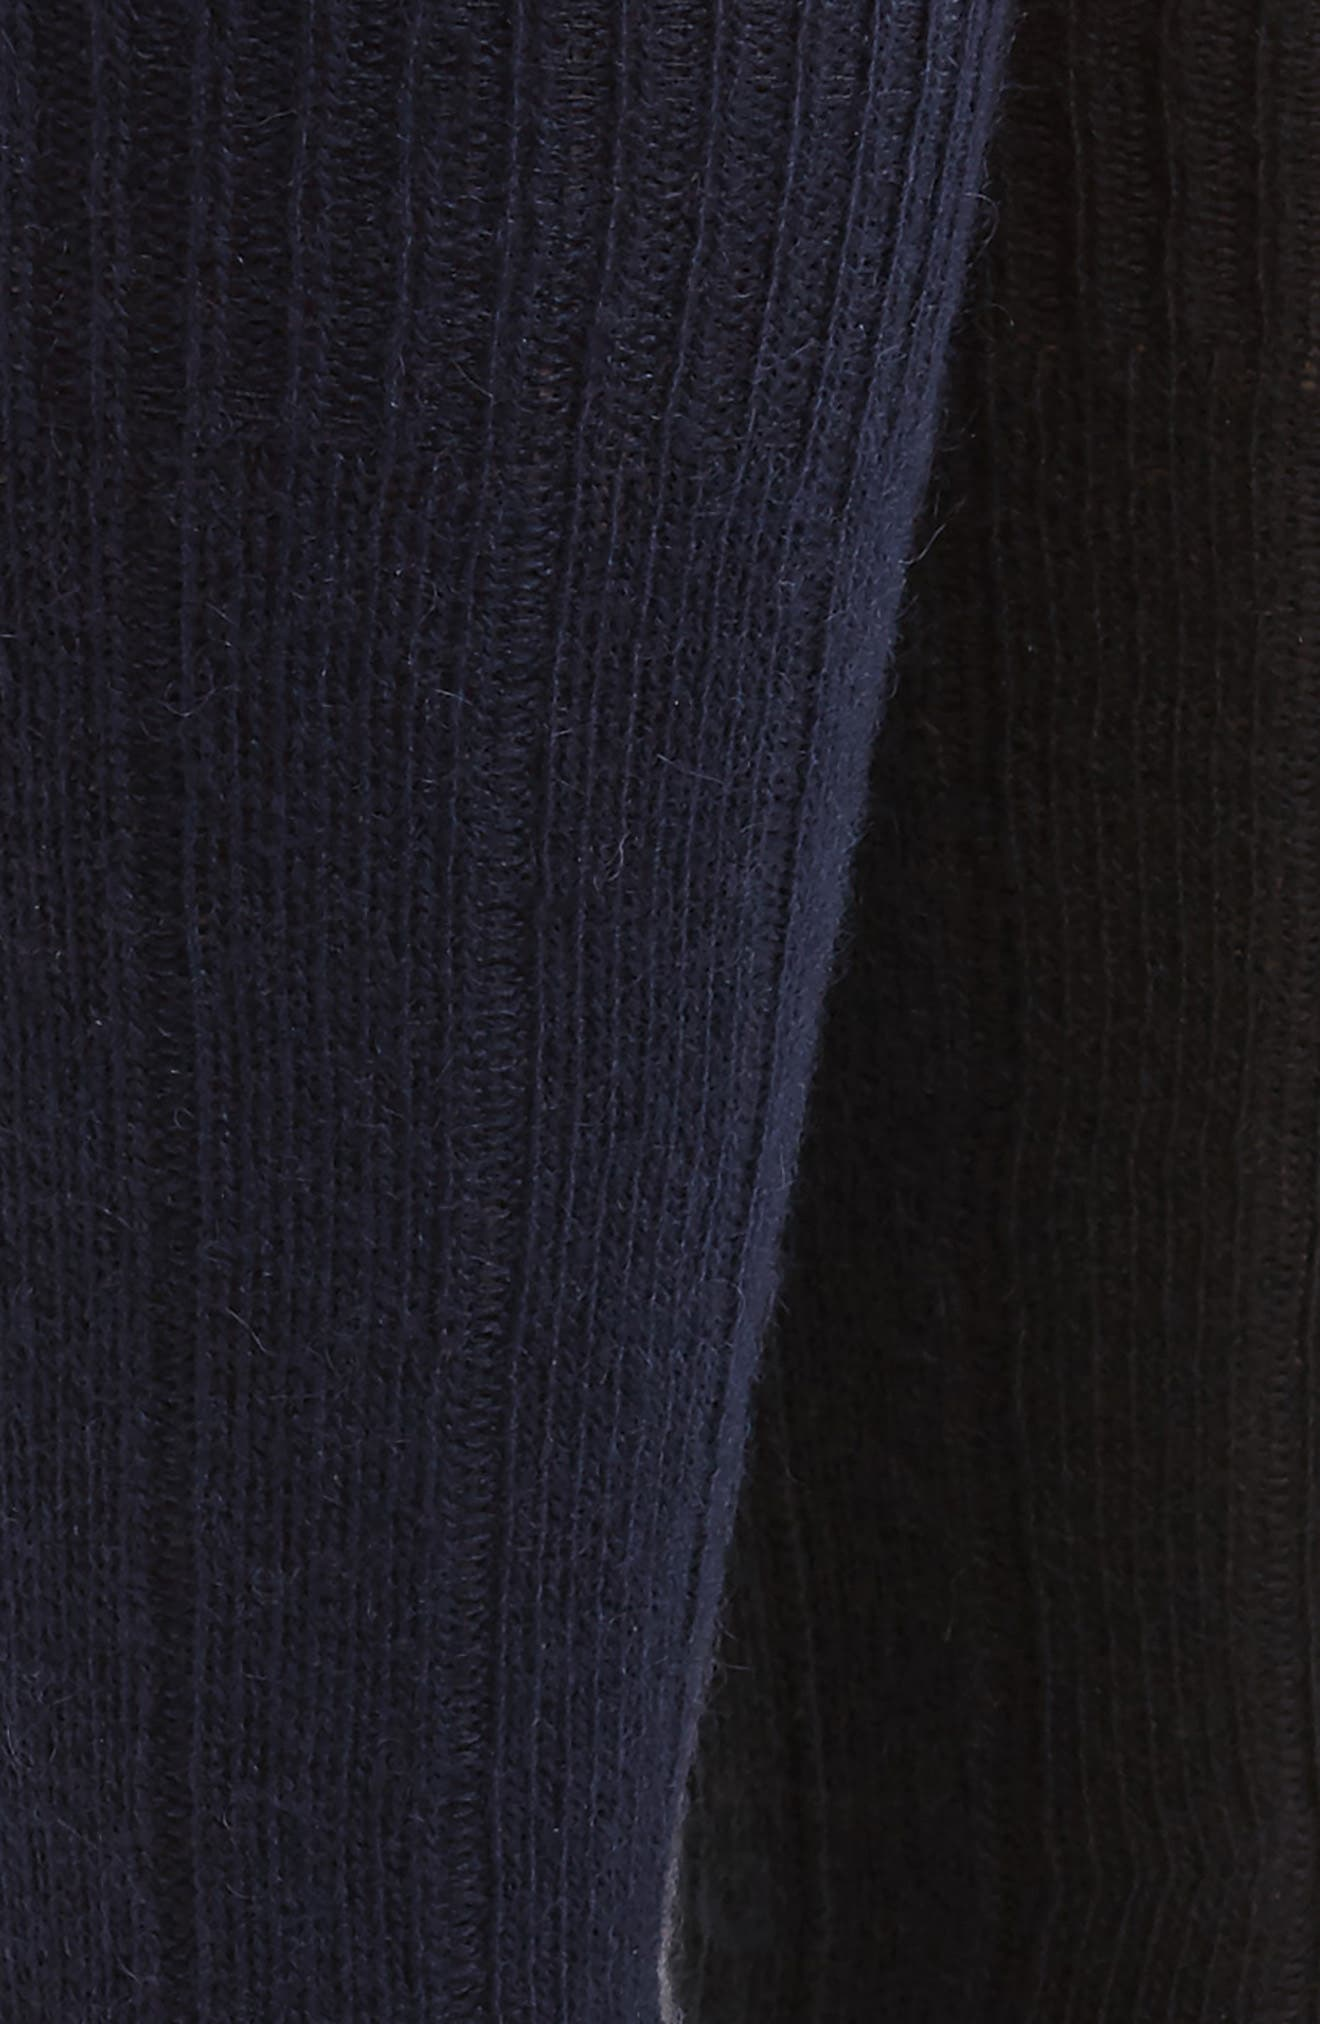 2-Pack Cashmere Blend Socks Box Set,                             Alternate thumbnail 4, color,